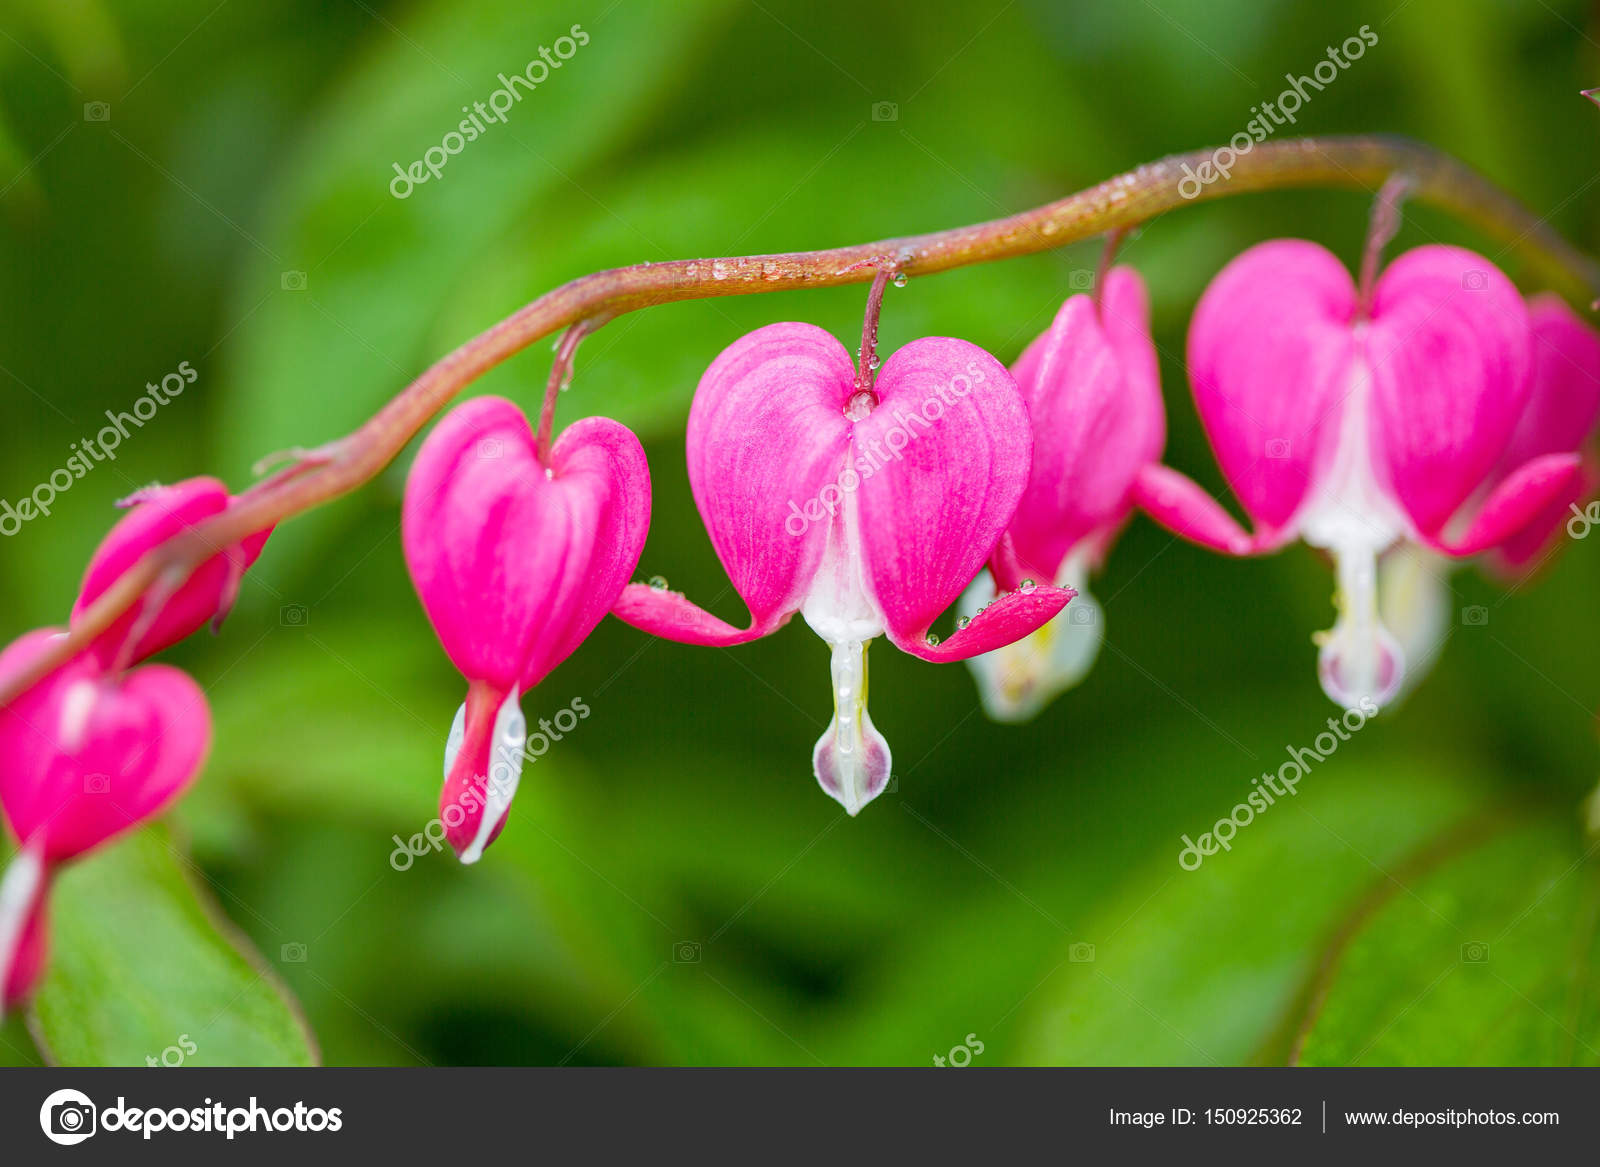 Blooming pink bleeding heart flowers dicentra spectabils stock blooming pink bleeding heart flowers dicentra spectabils over nature background close up photo by sichkarenkocom mightylinksfo